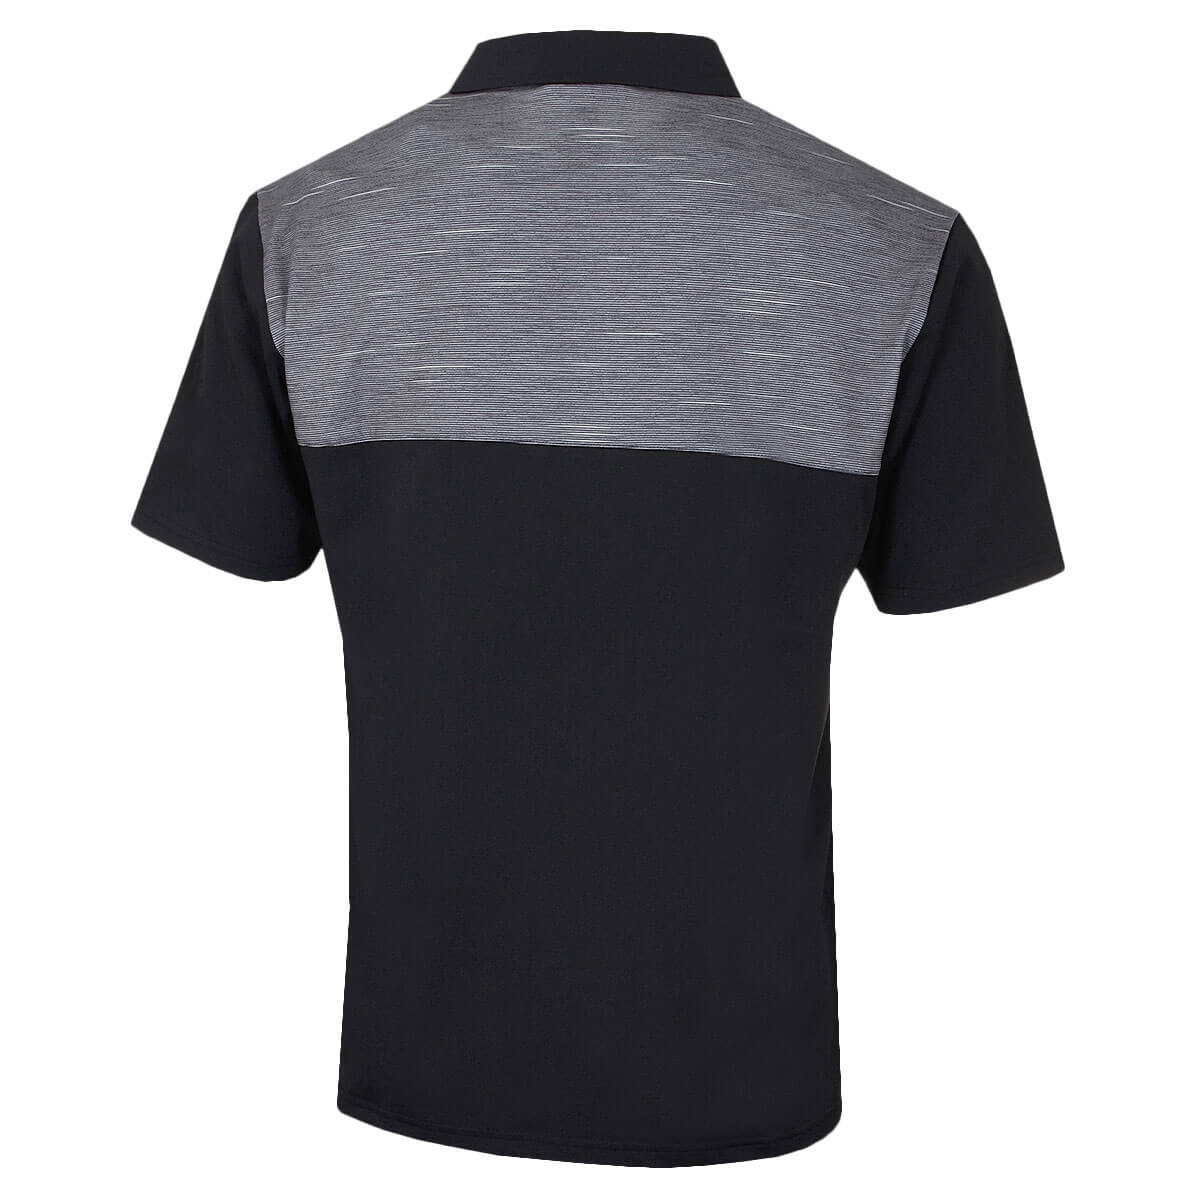 Island-Green-Mens-Golf-IGTS1891-Contrast-Yoke-Polo-Shirt-53-OFF-RRP thumbnail 3